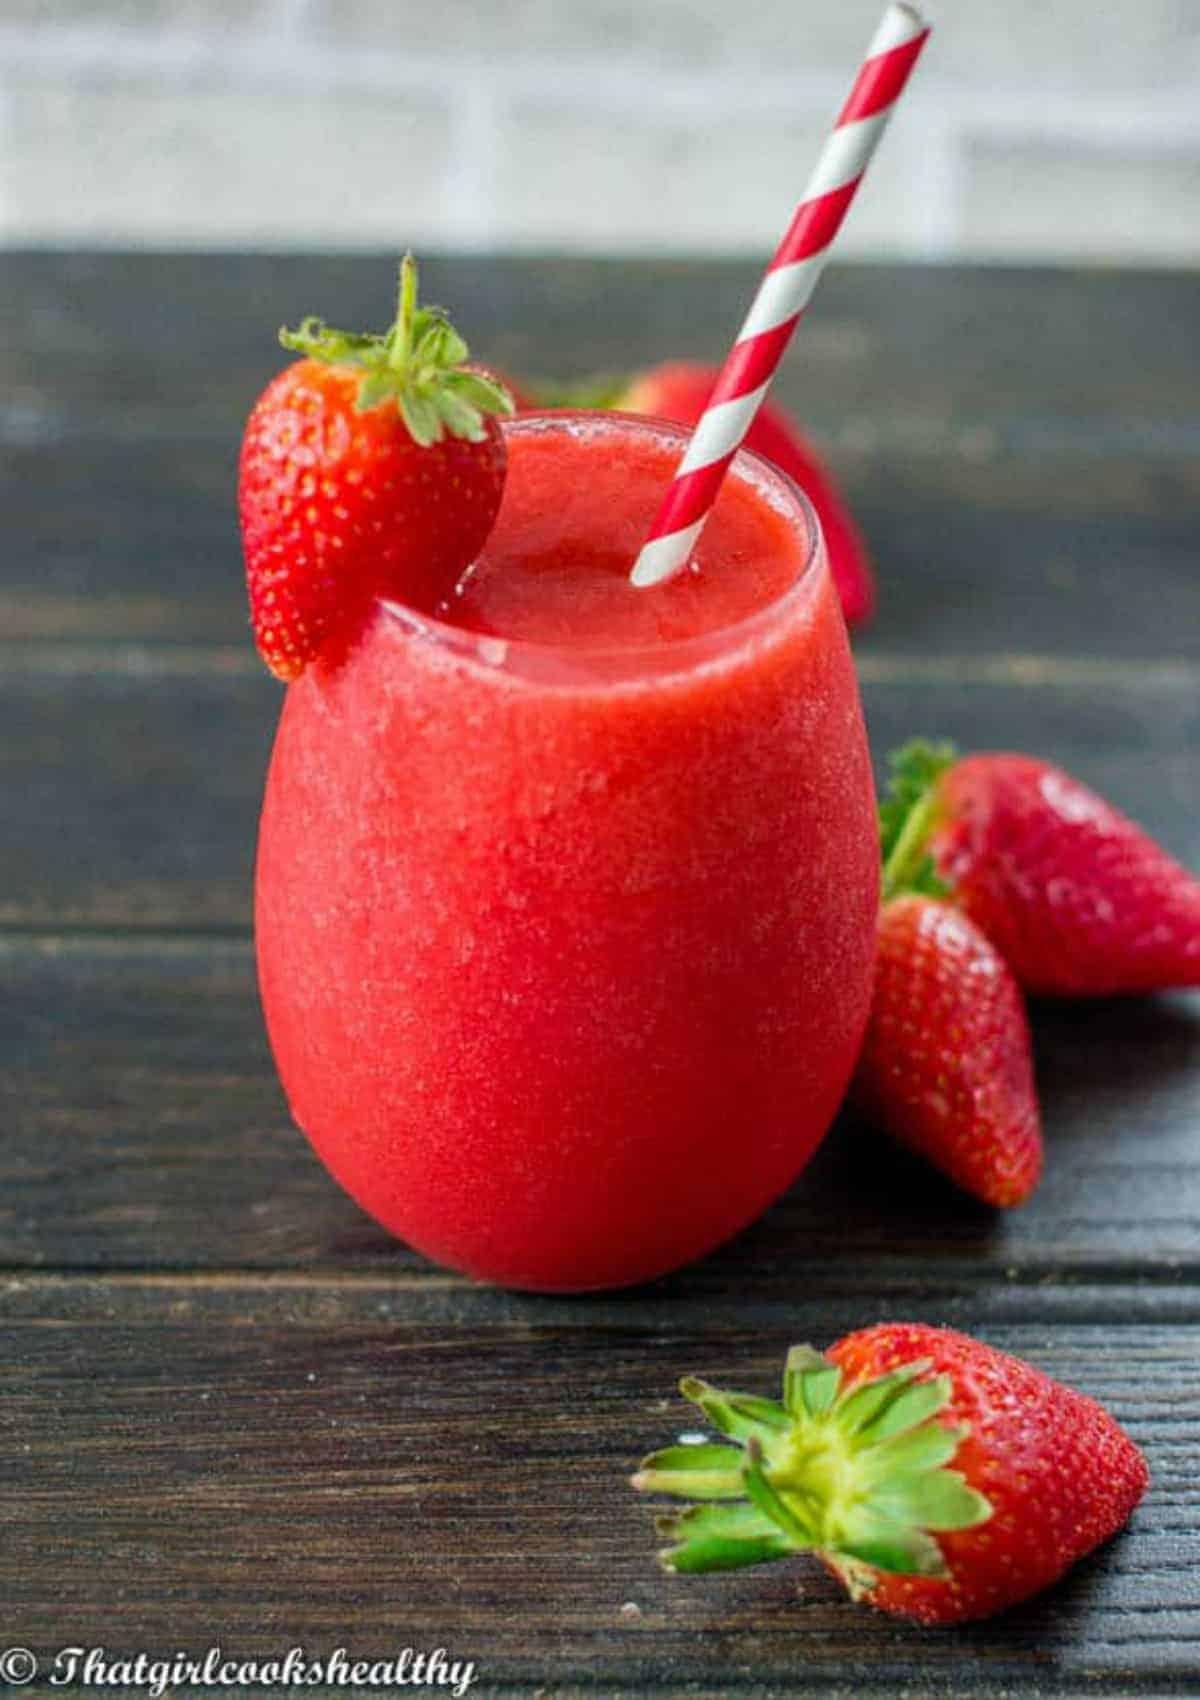 slushie in a glass with strawberries around it